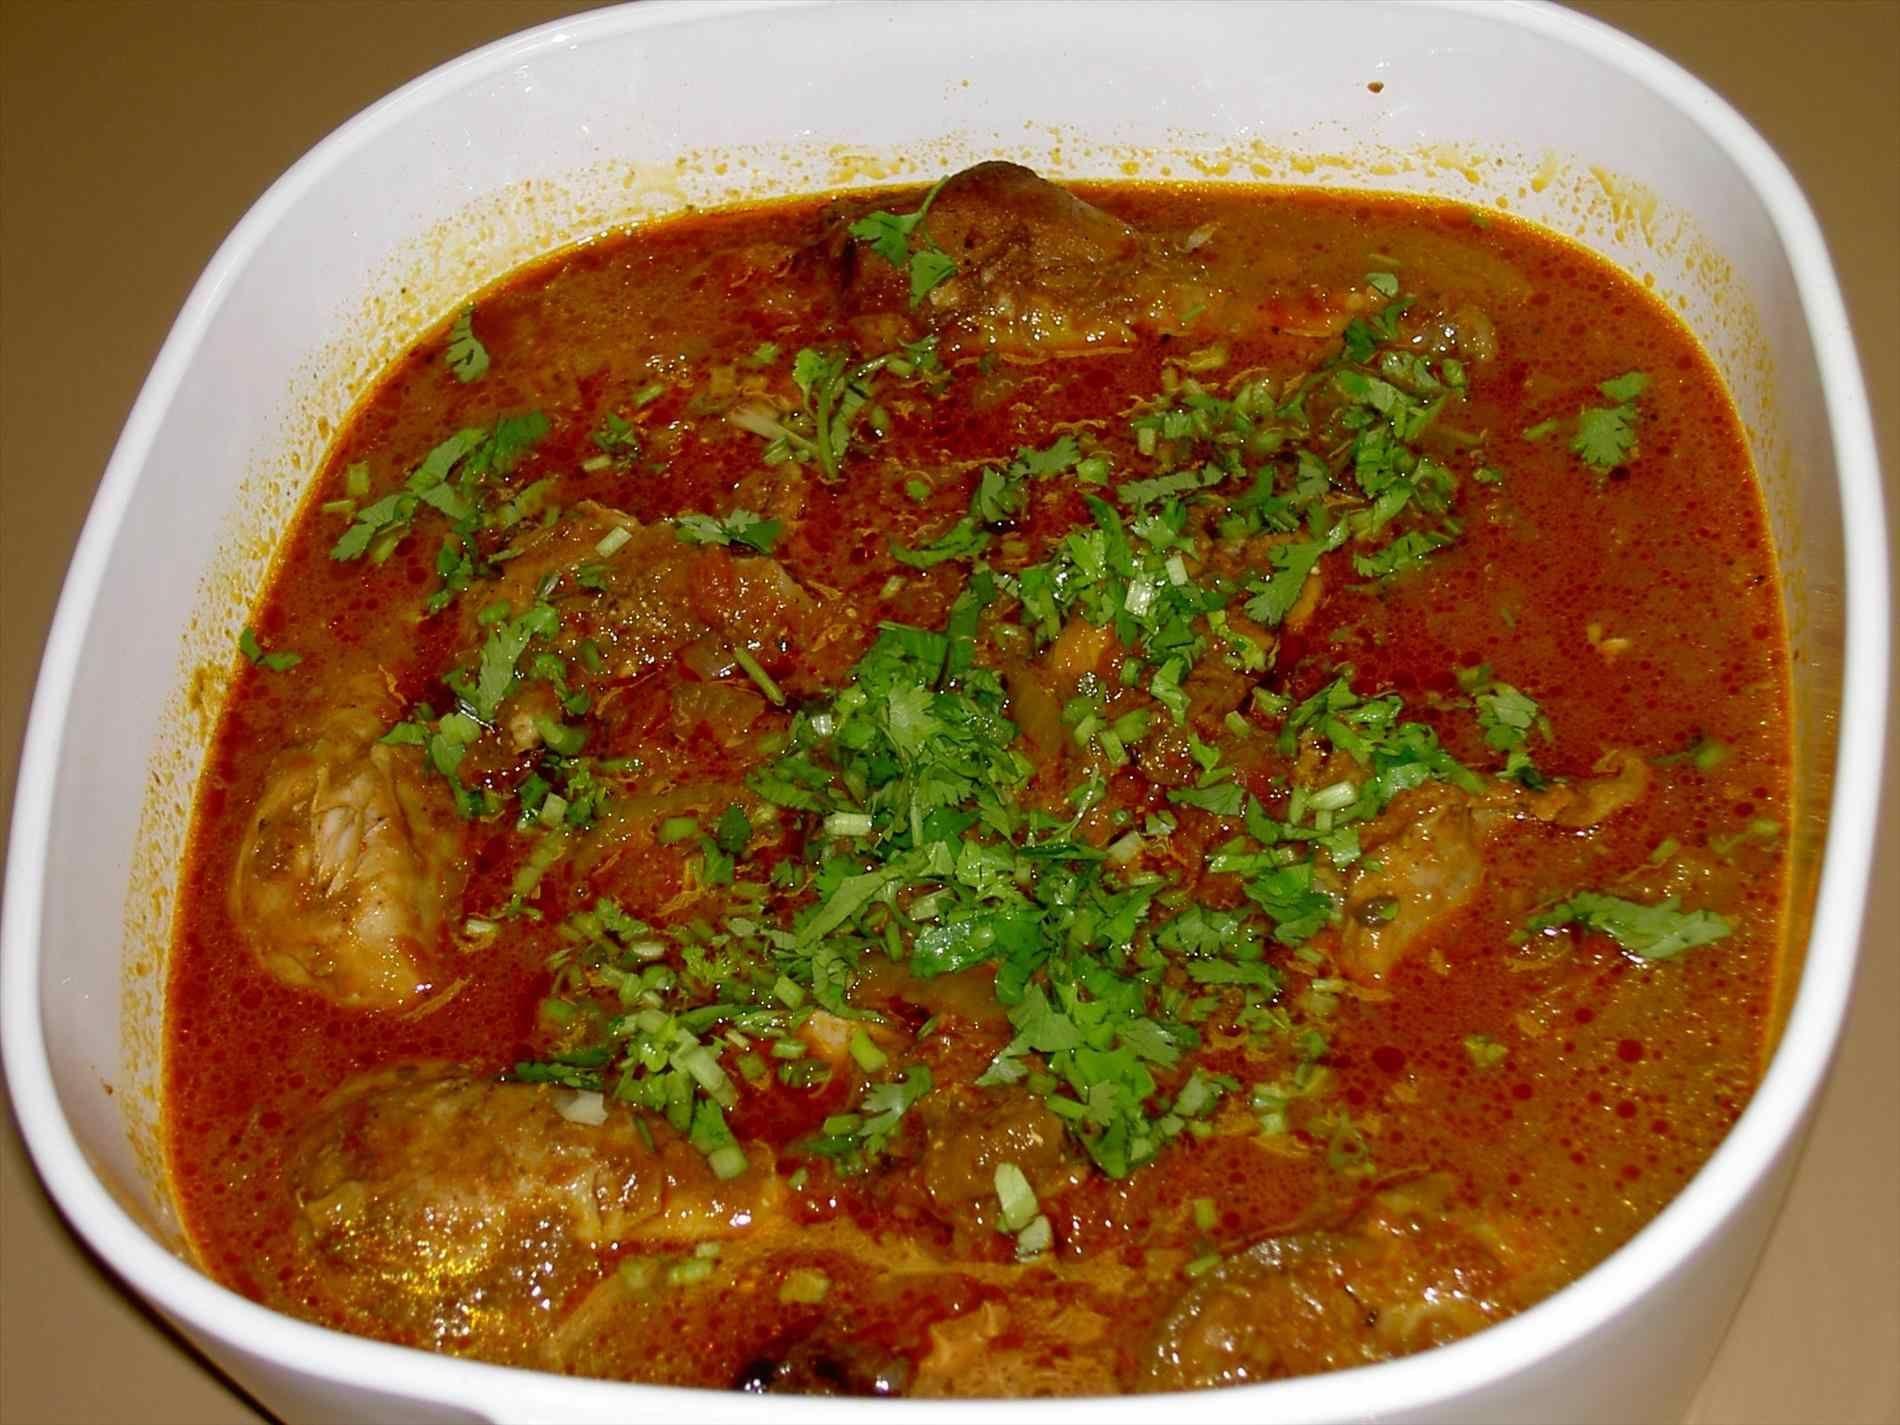 Gravy Recipes In Urdu Of Food U Desi Style Pakistani Recipe Video How To Cook Restaurant Recipe Chicken Gravy Chicken Gravy Recipe Recipes Indian Food Recipes